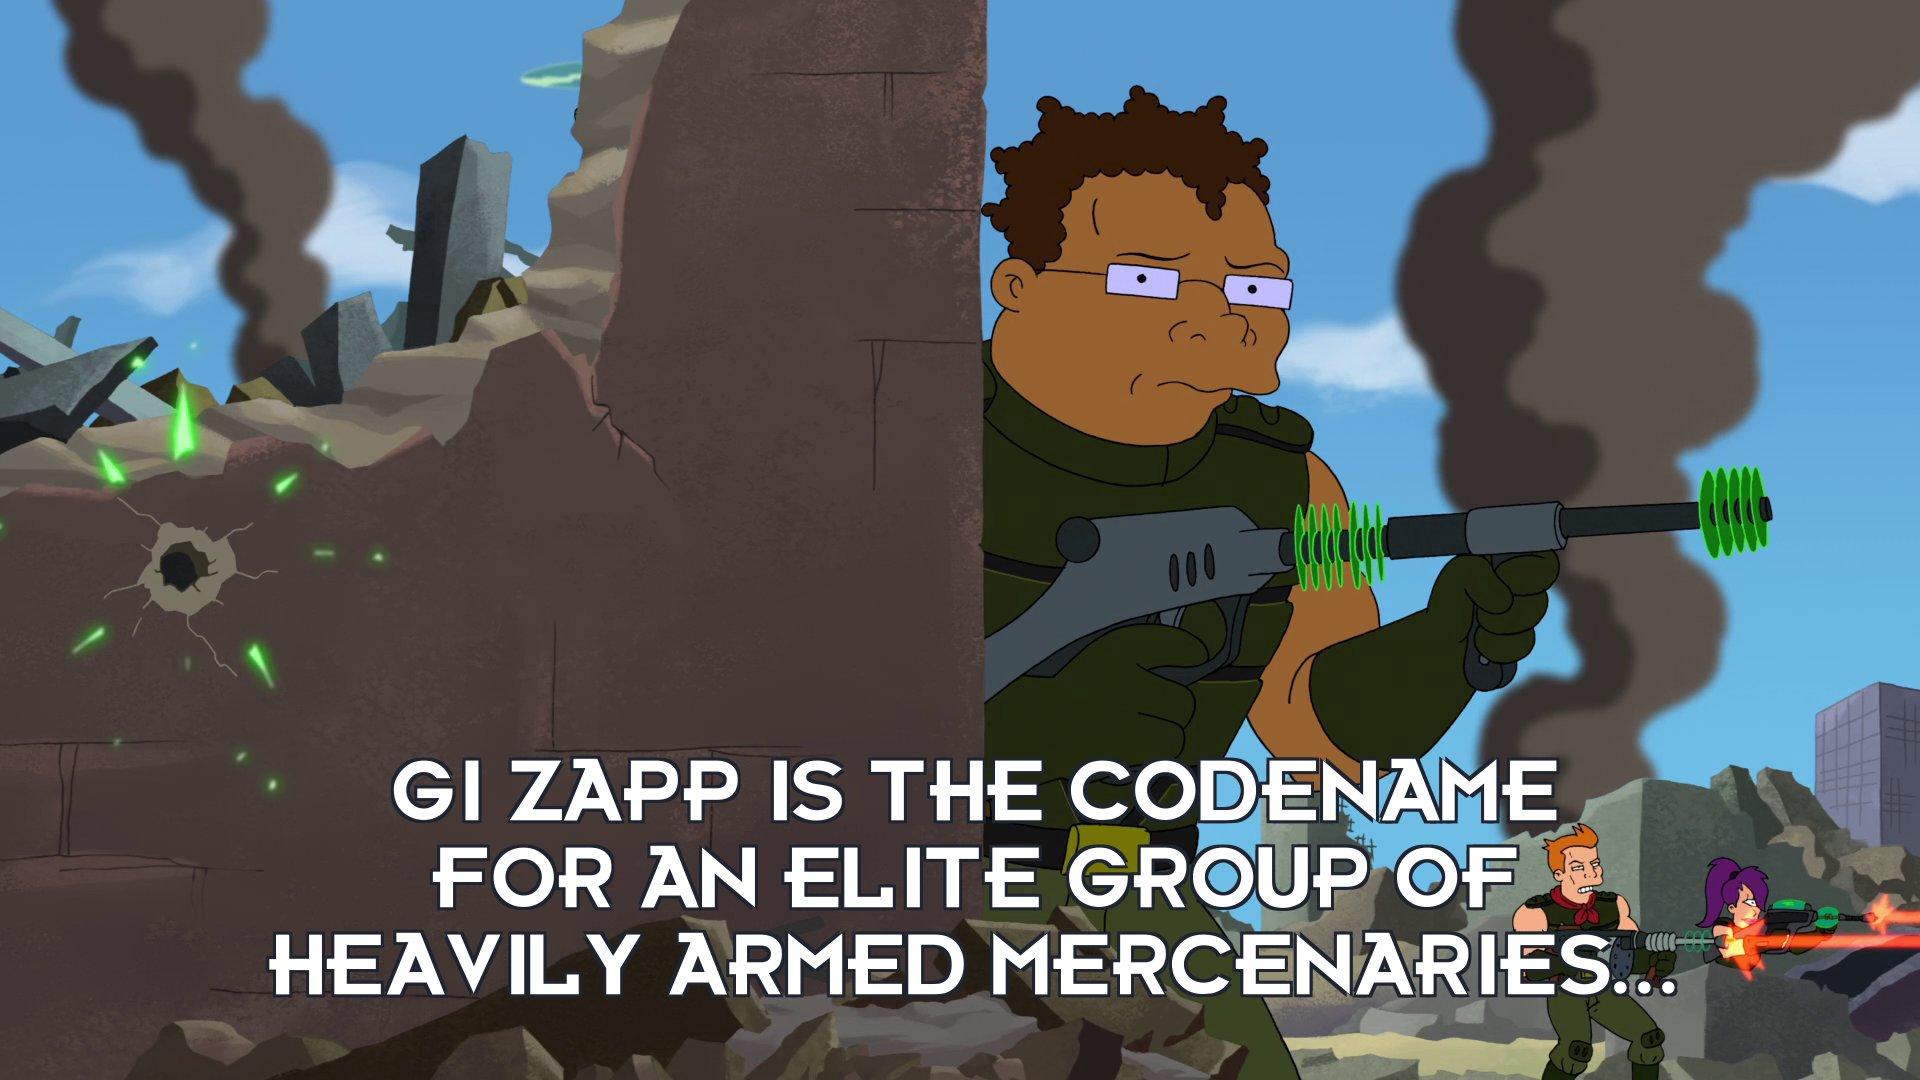 Narrator: GI Zapp is the codename for an elite group of heavily armed mercenaries...